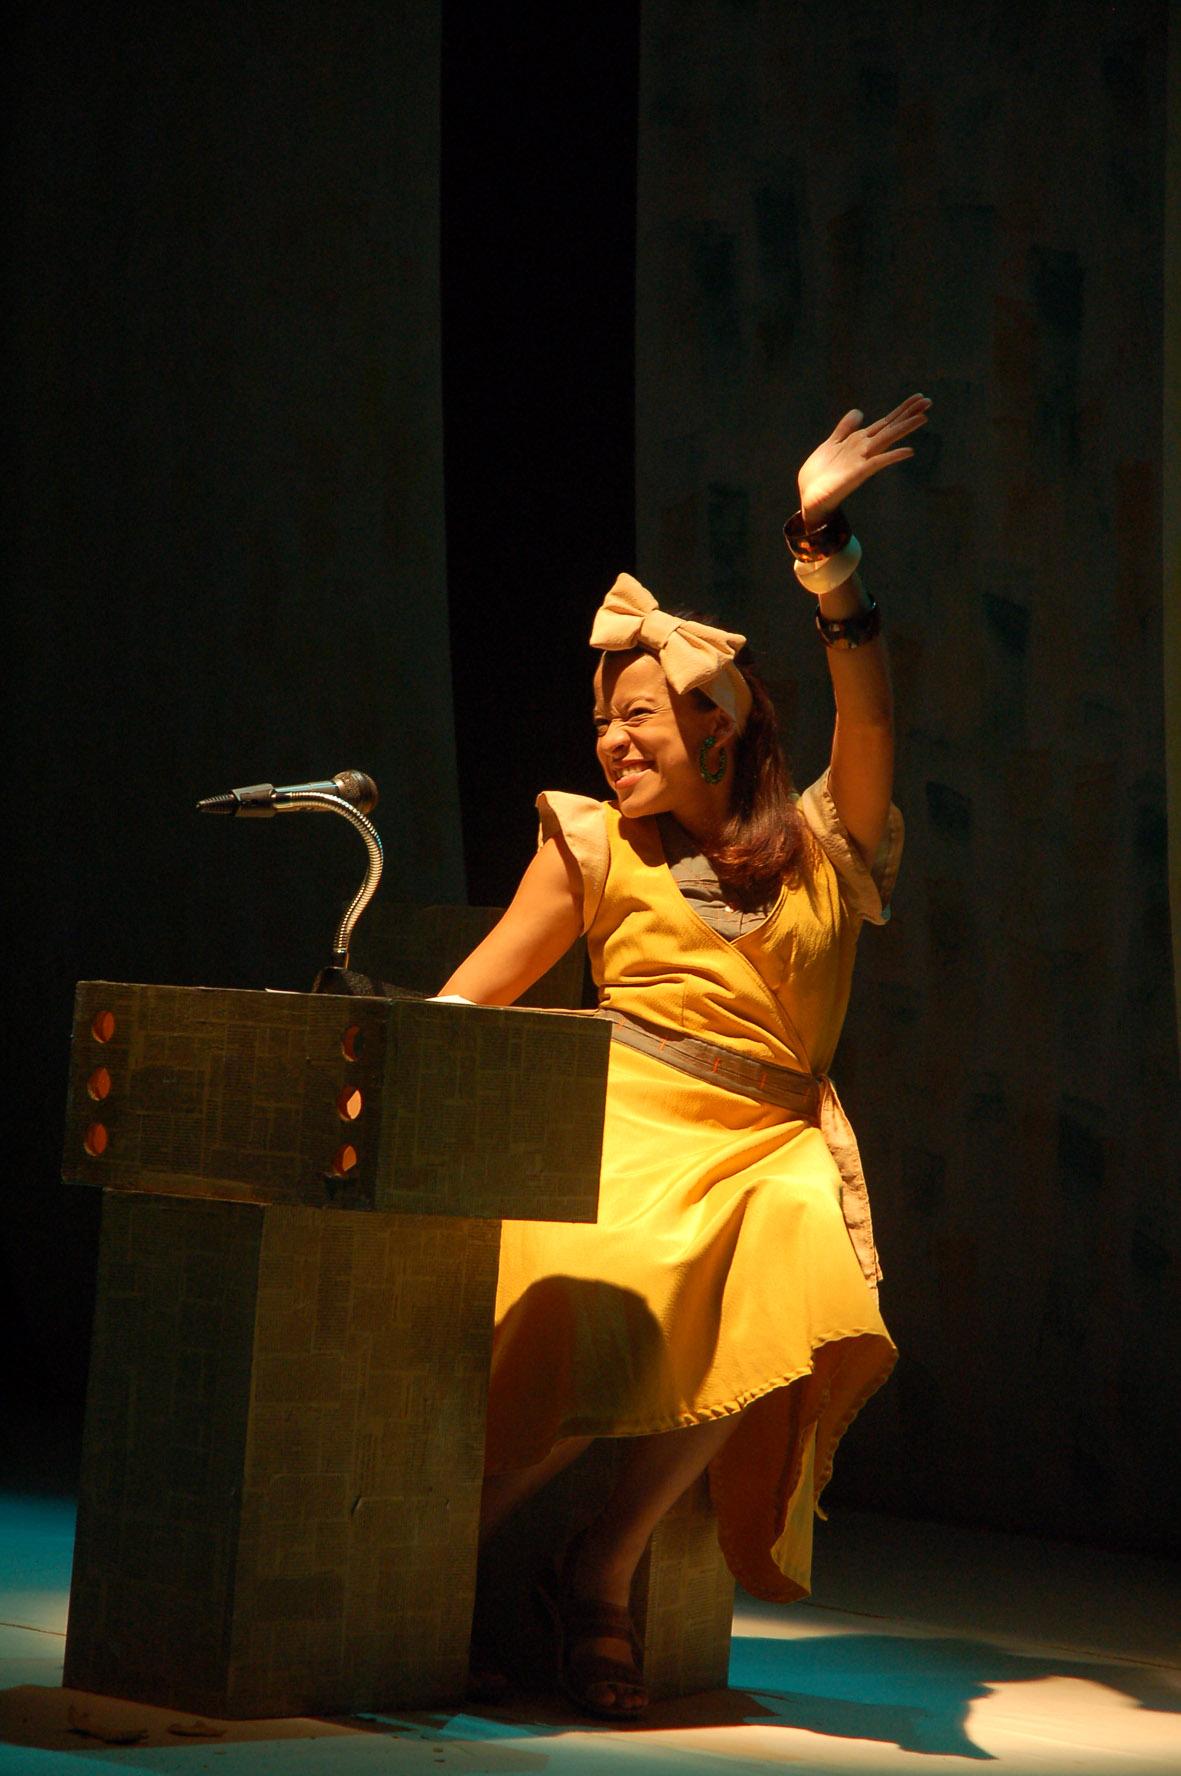 VERSOS DE UM LAMBE SOLA - Renata Voss (1